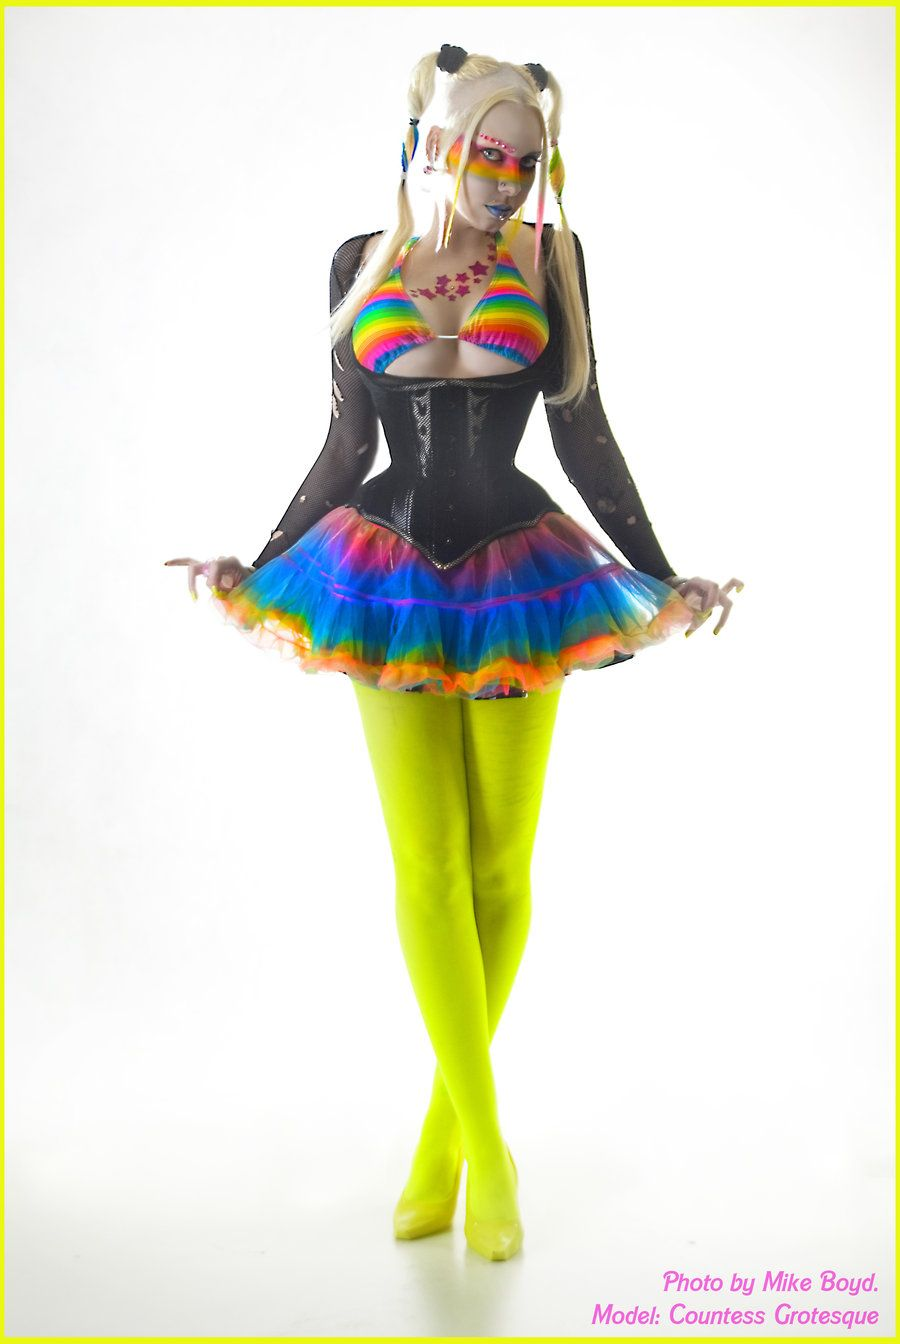 Green dress on pale skin   best images about кіберпанк і косплей on Pinterest  Cybergoth